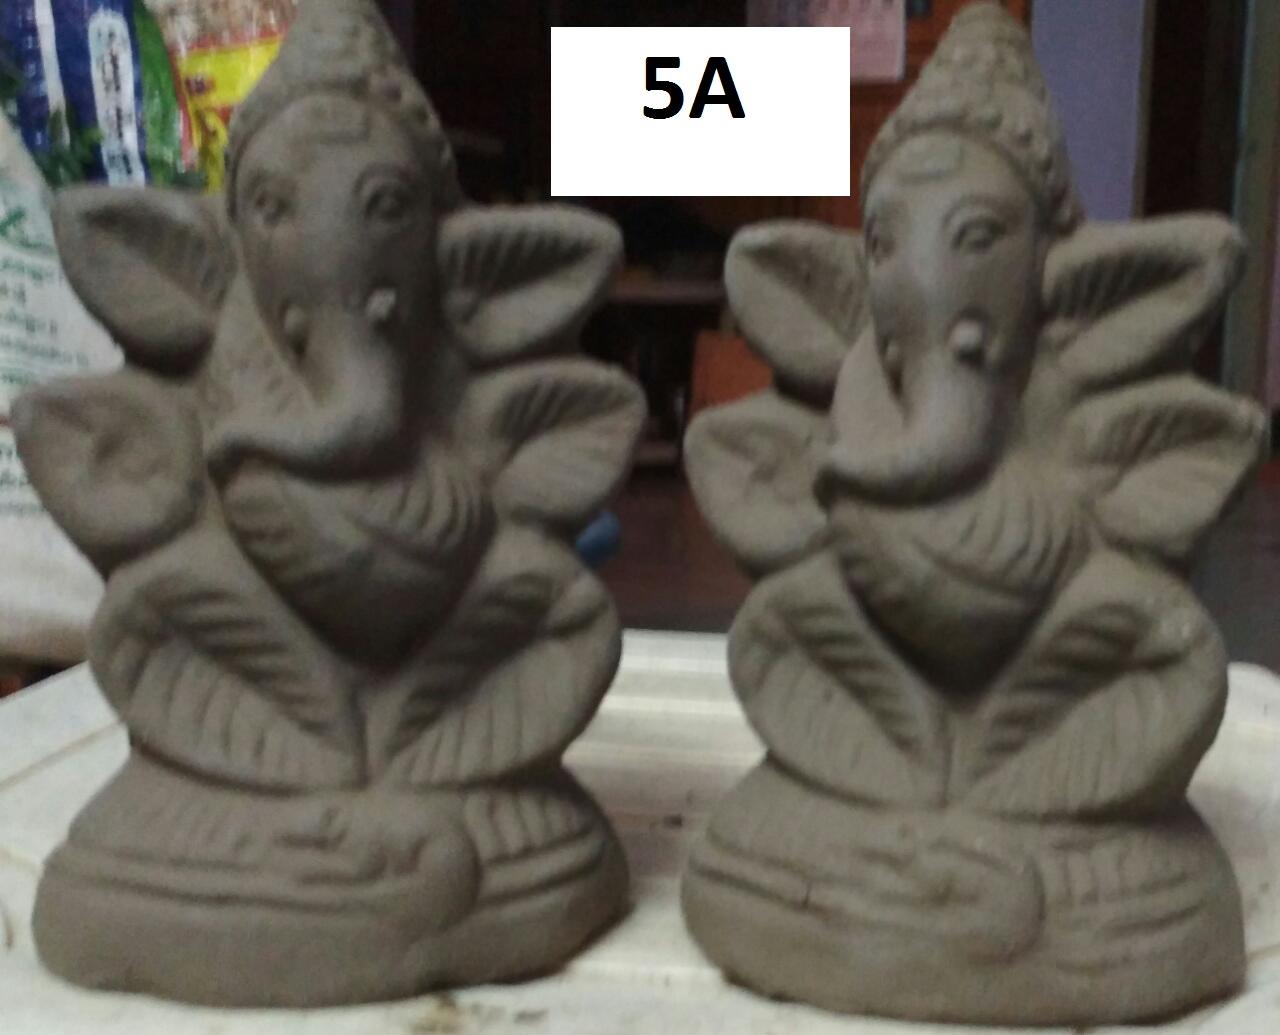 Eco Friendly Clay Ganesh Idols & Moulds/Dyes in Hyderabad